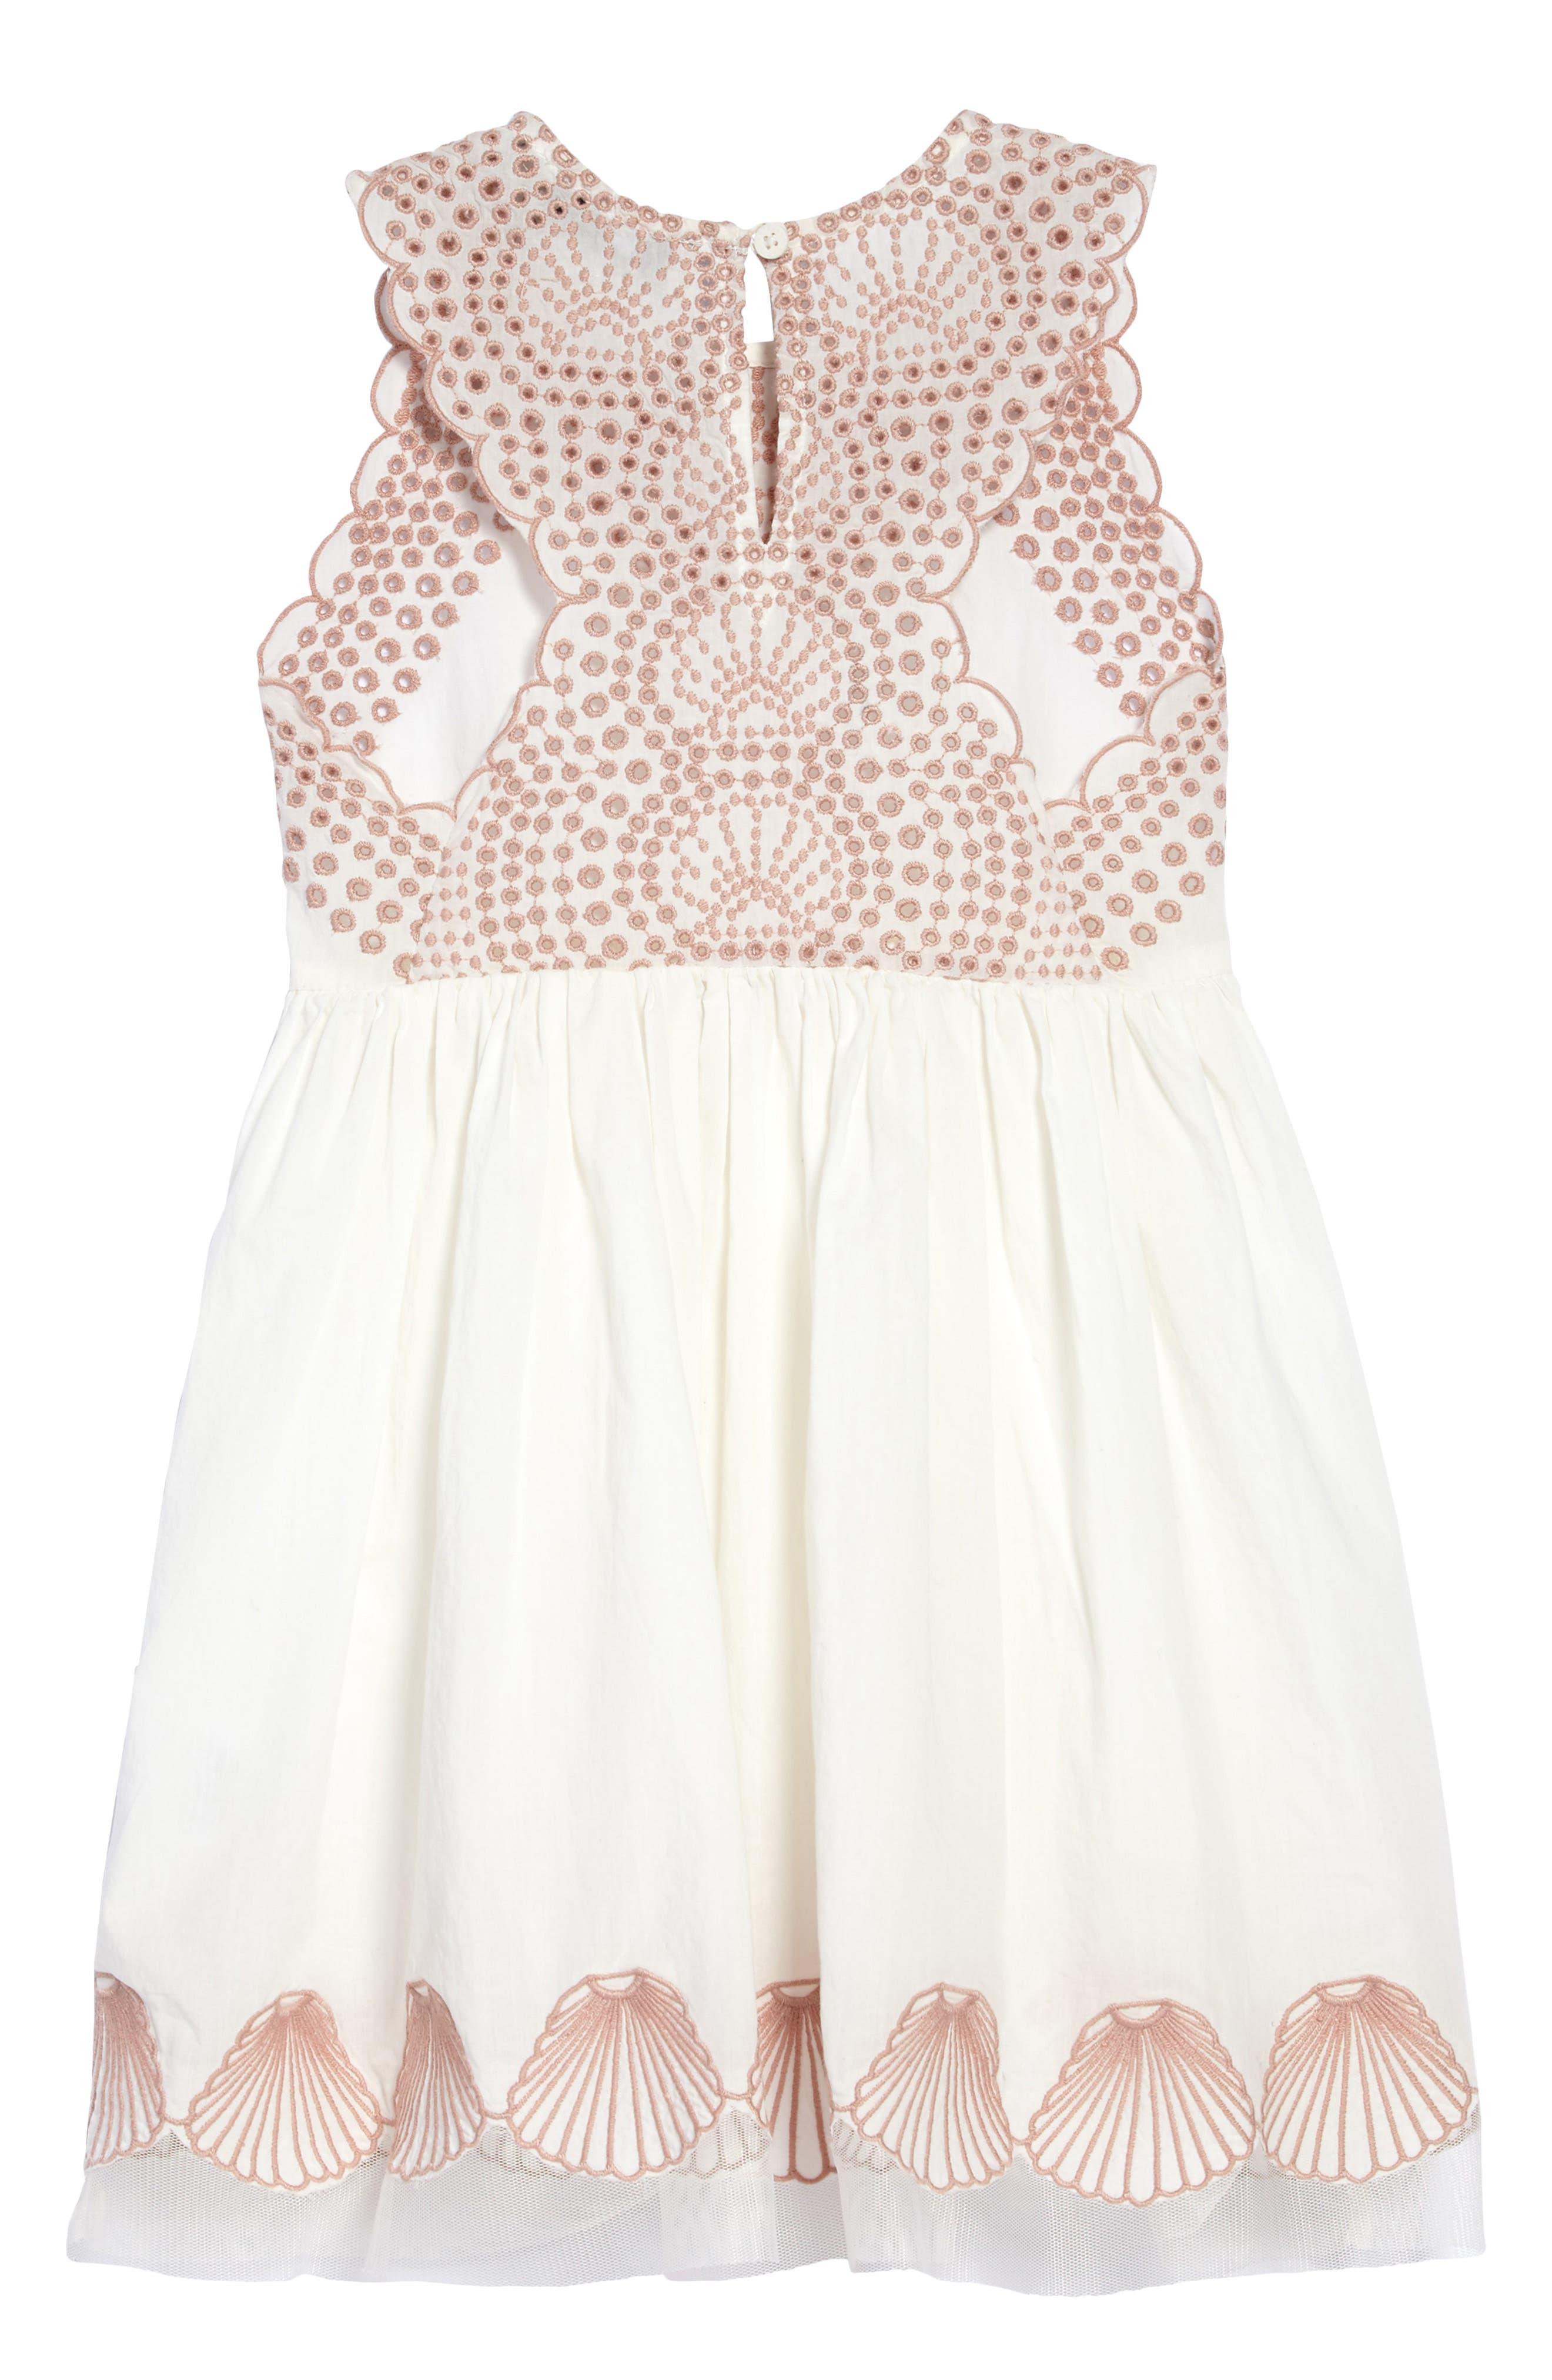 STELLA MCCARTNEY,                             Embroidered Sleeveless Dress,                             Alternate thumbnail 2, color,                             900